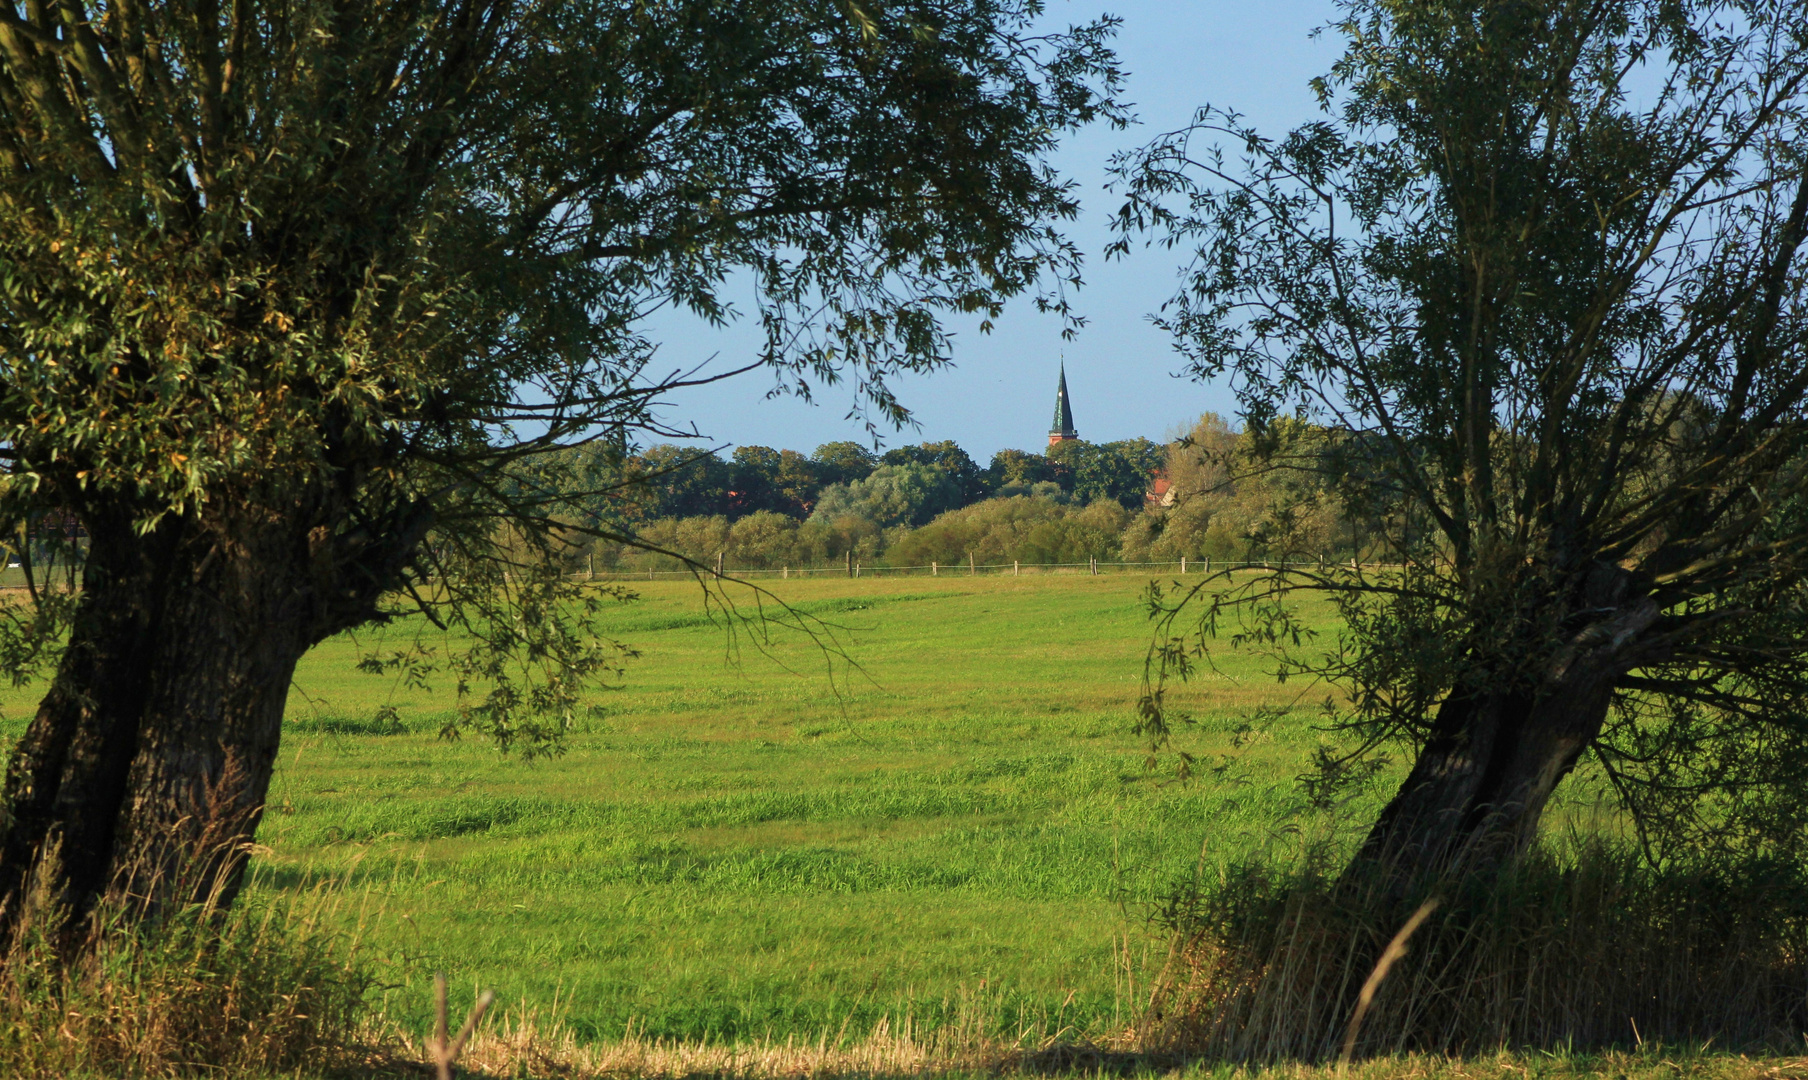 Kirchturm von Dömitz/Elbe